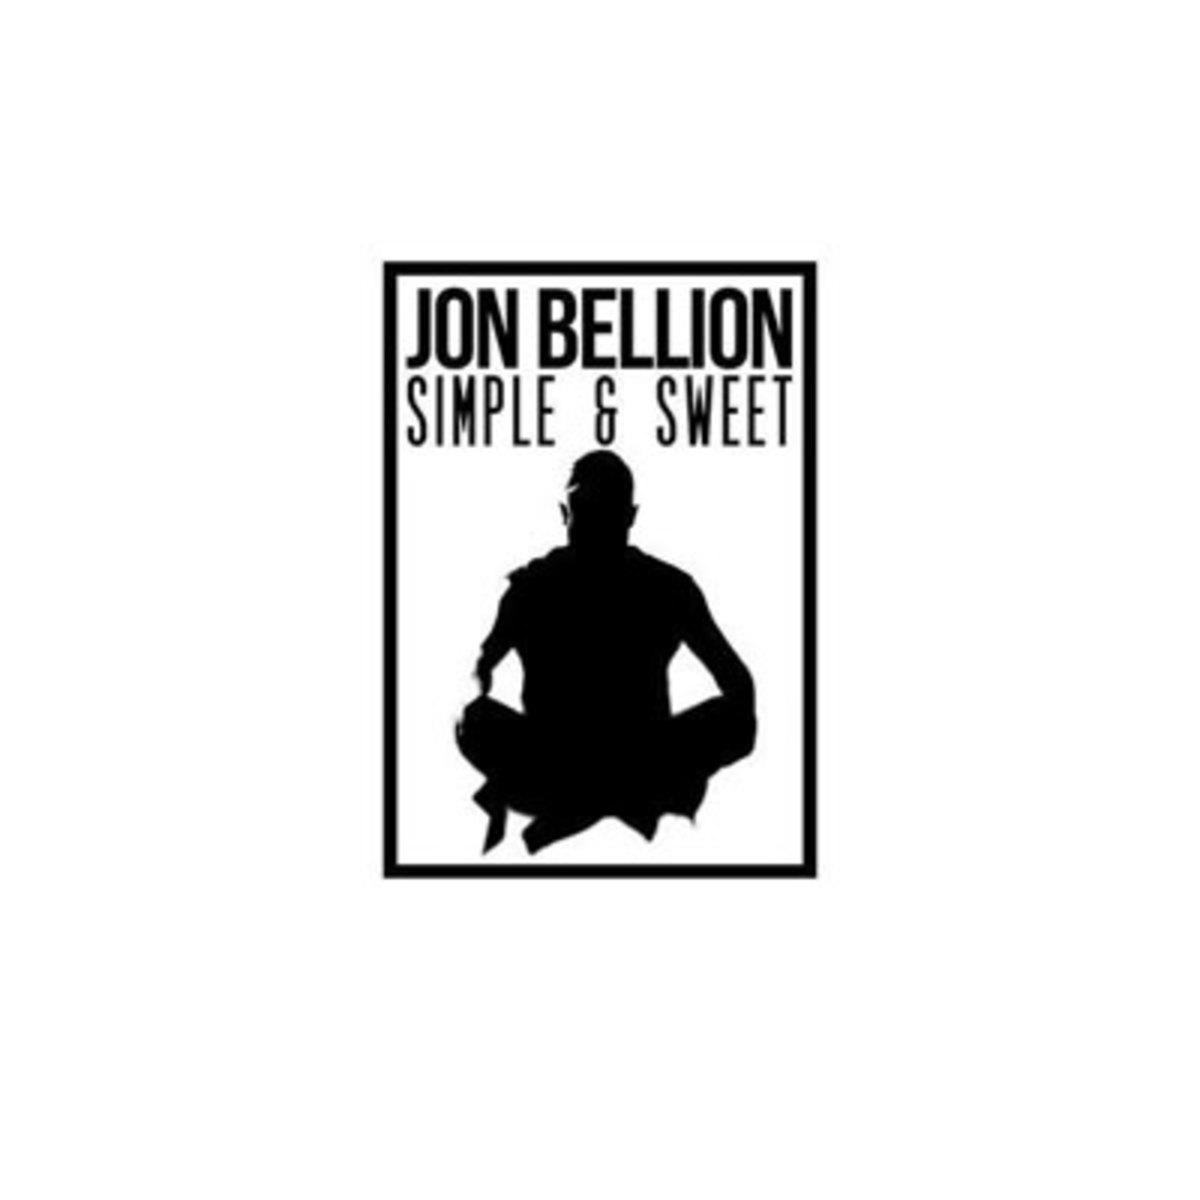 jonbellion-simplesweet.jpg